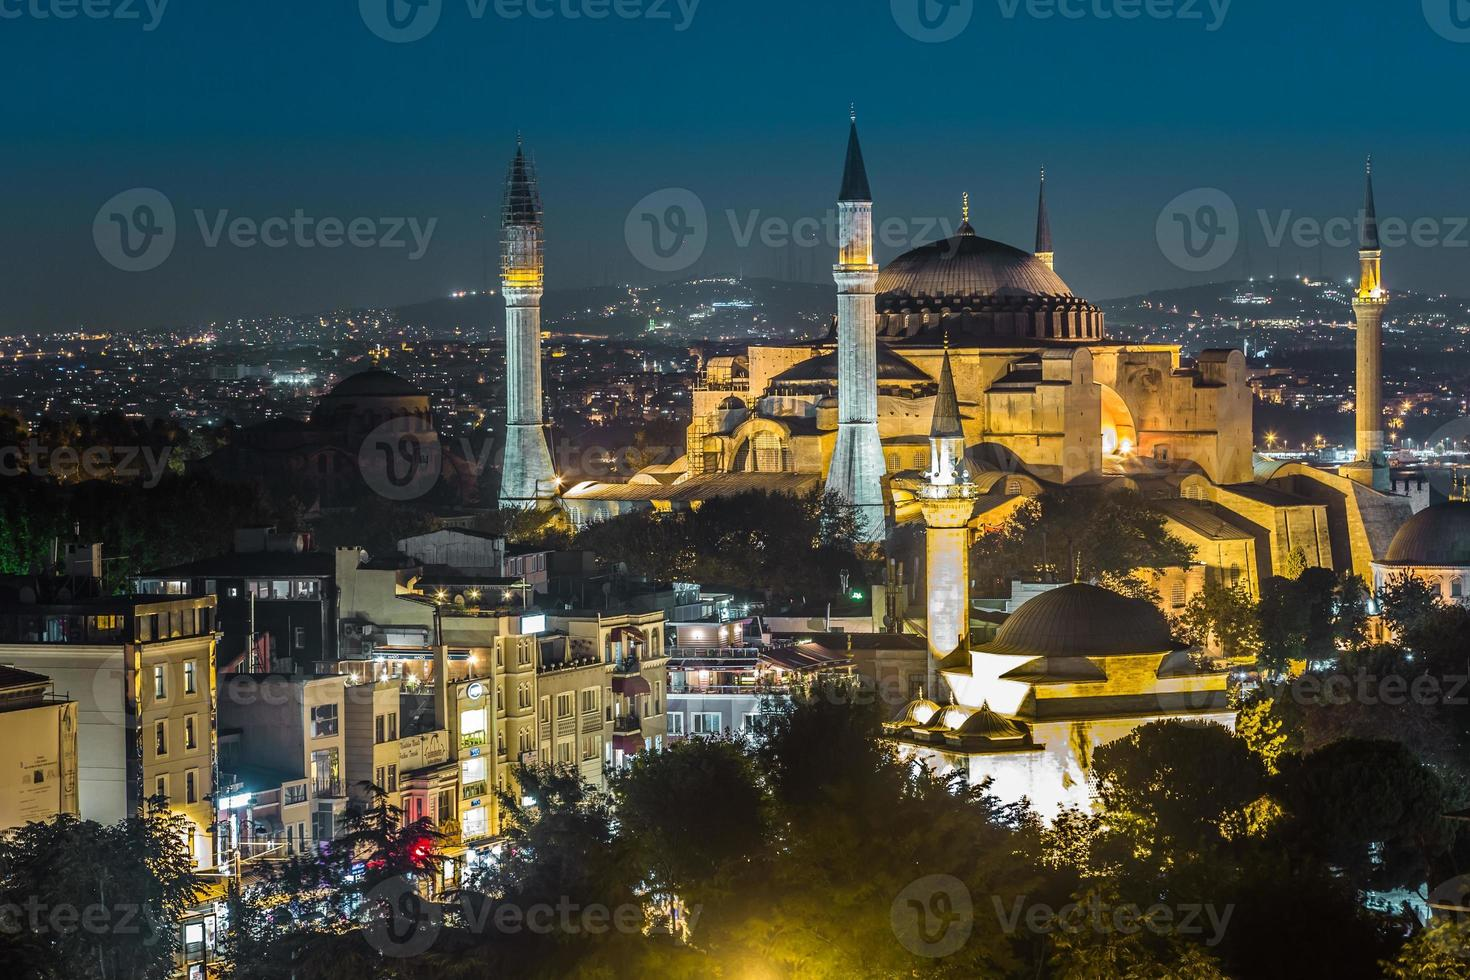 visão noturna da hagia sophia em Istambul, Turquia foto